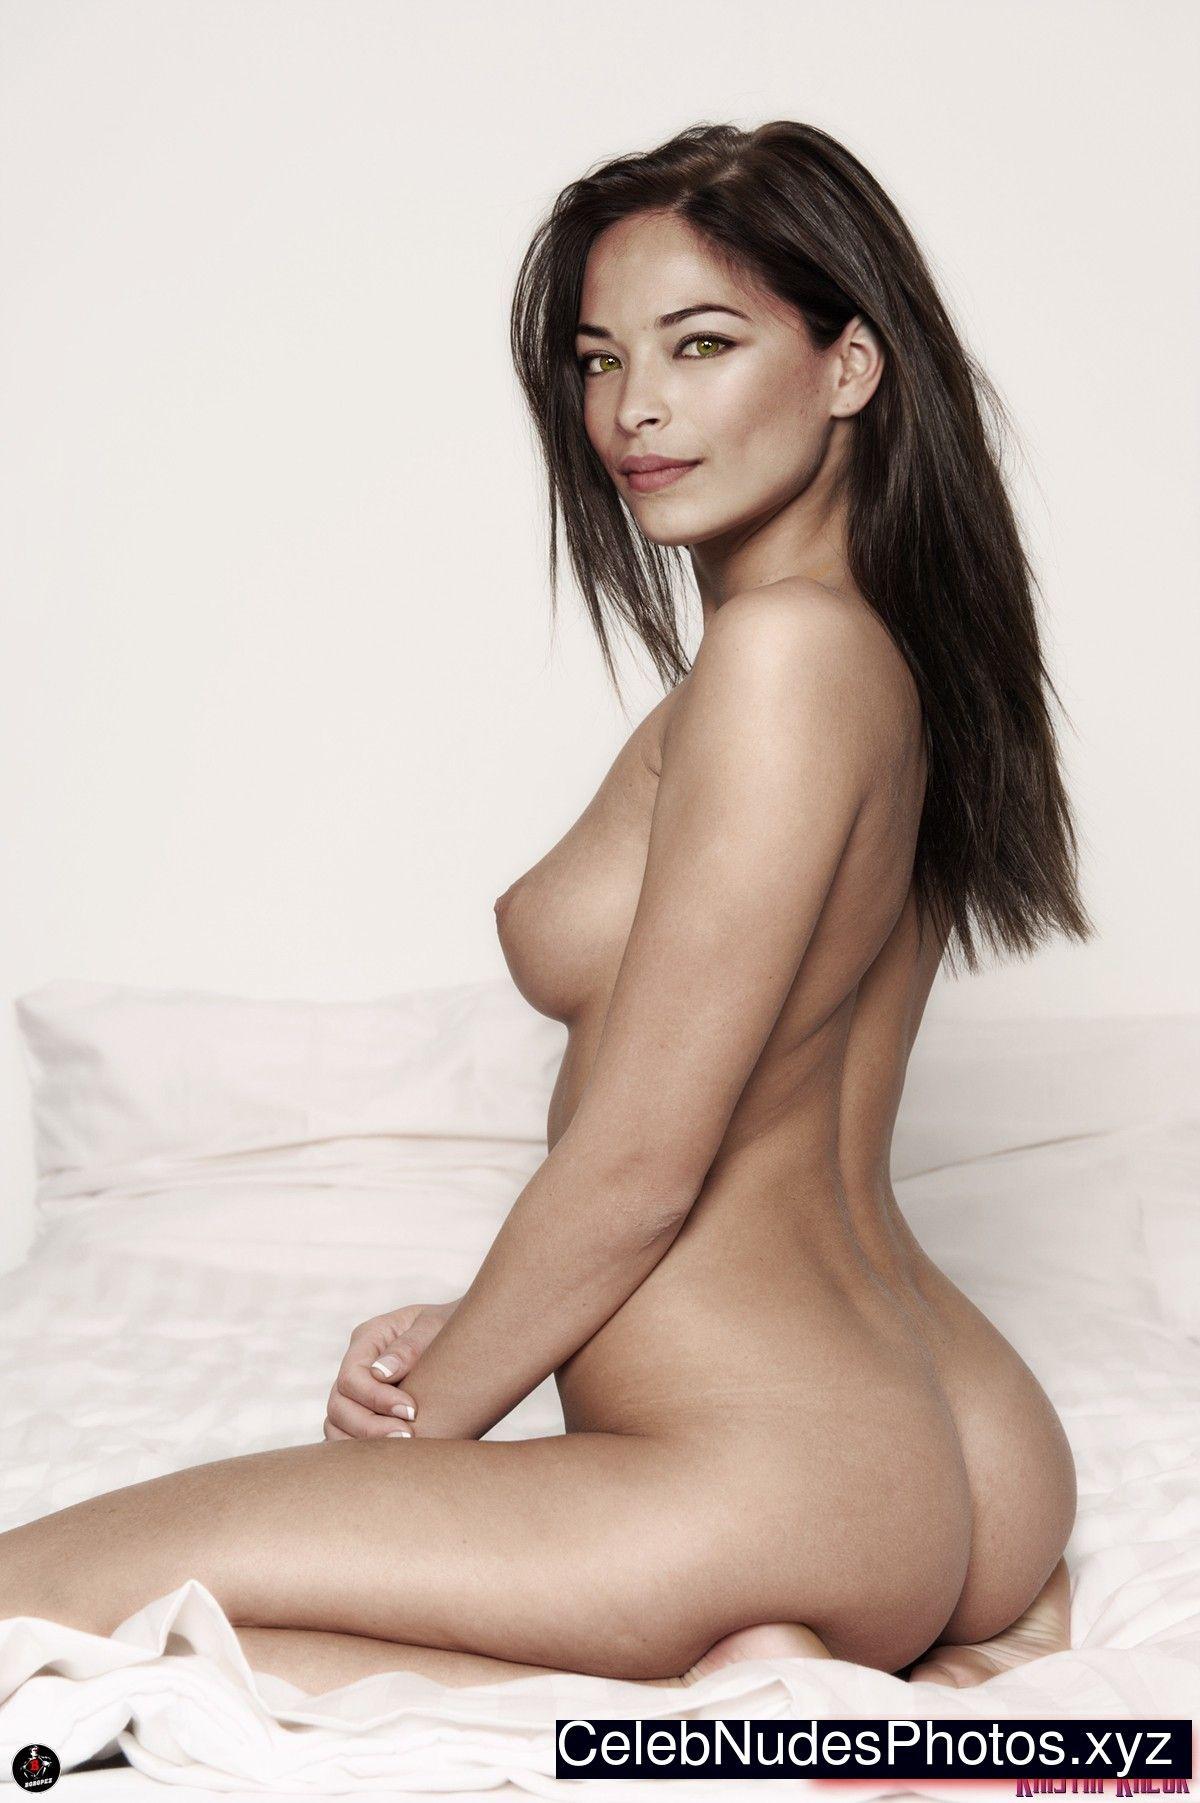 Holt kristin nude pic seems brilliant